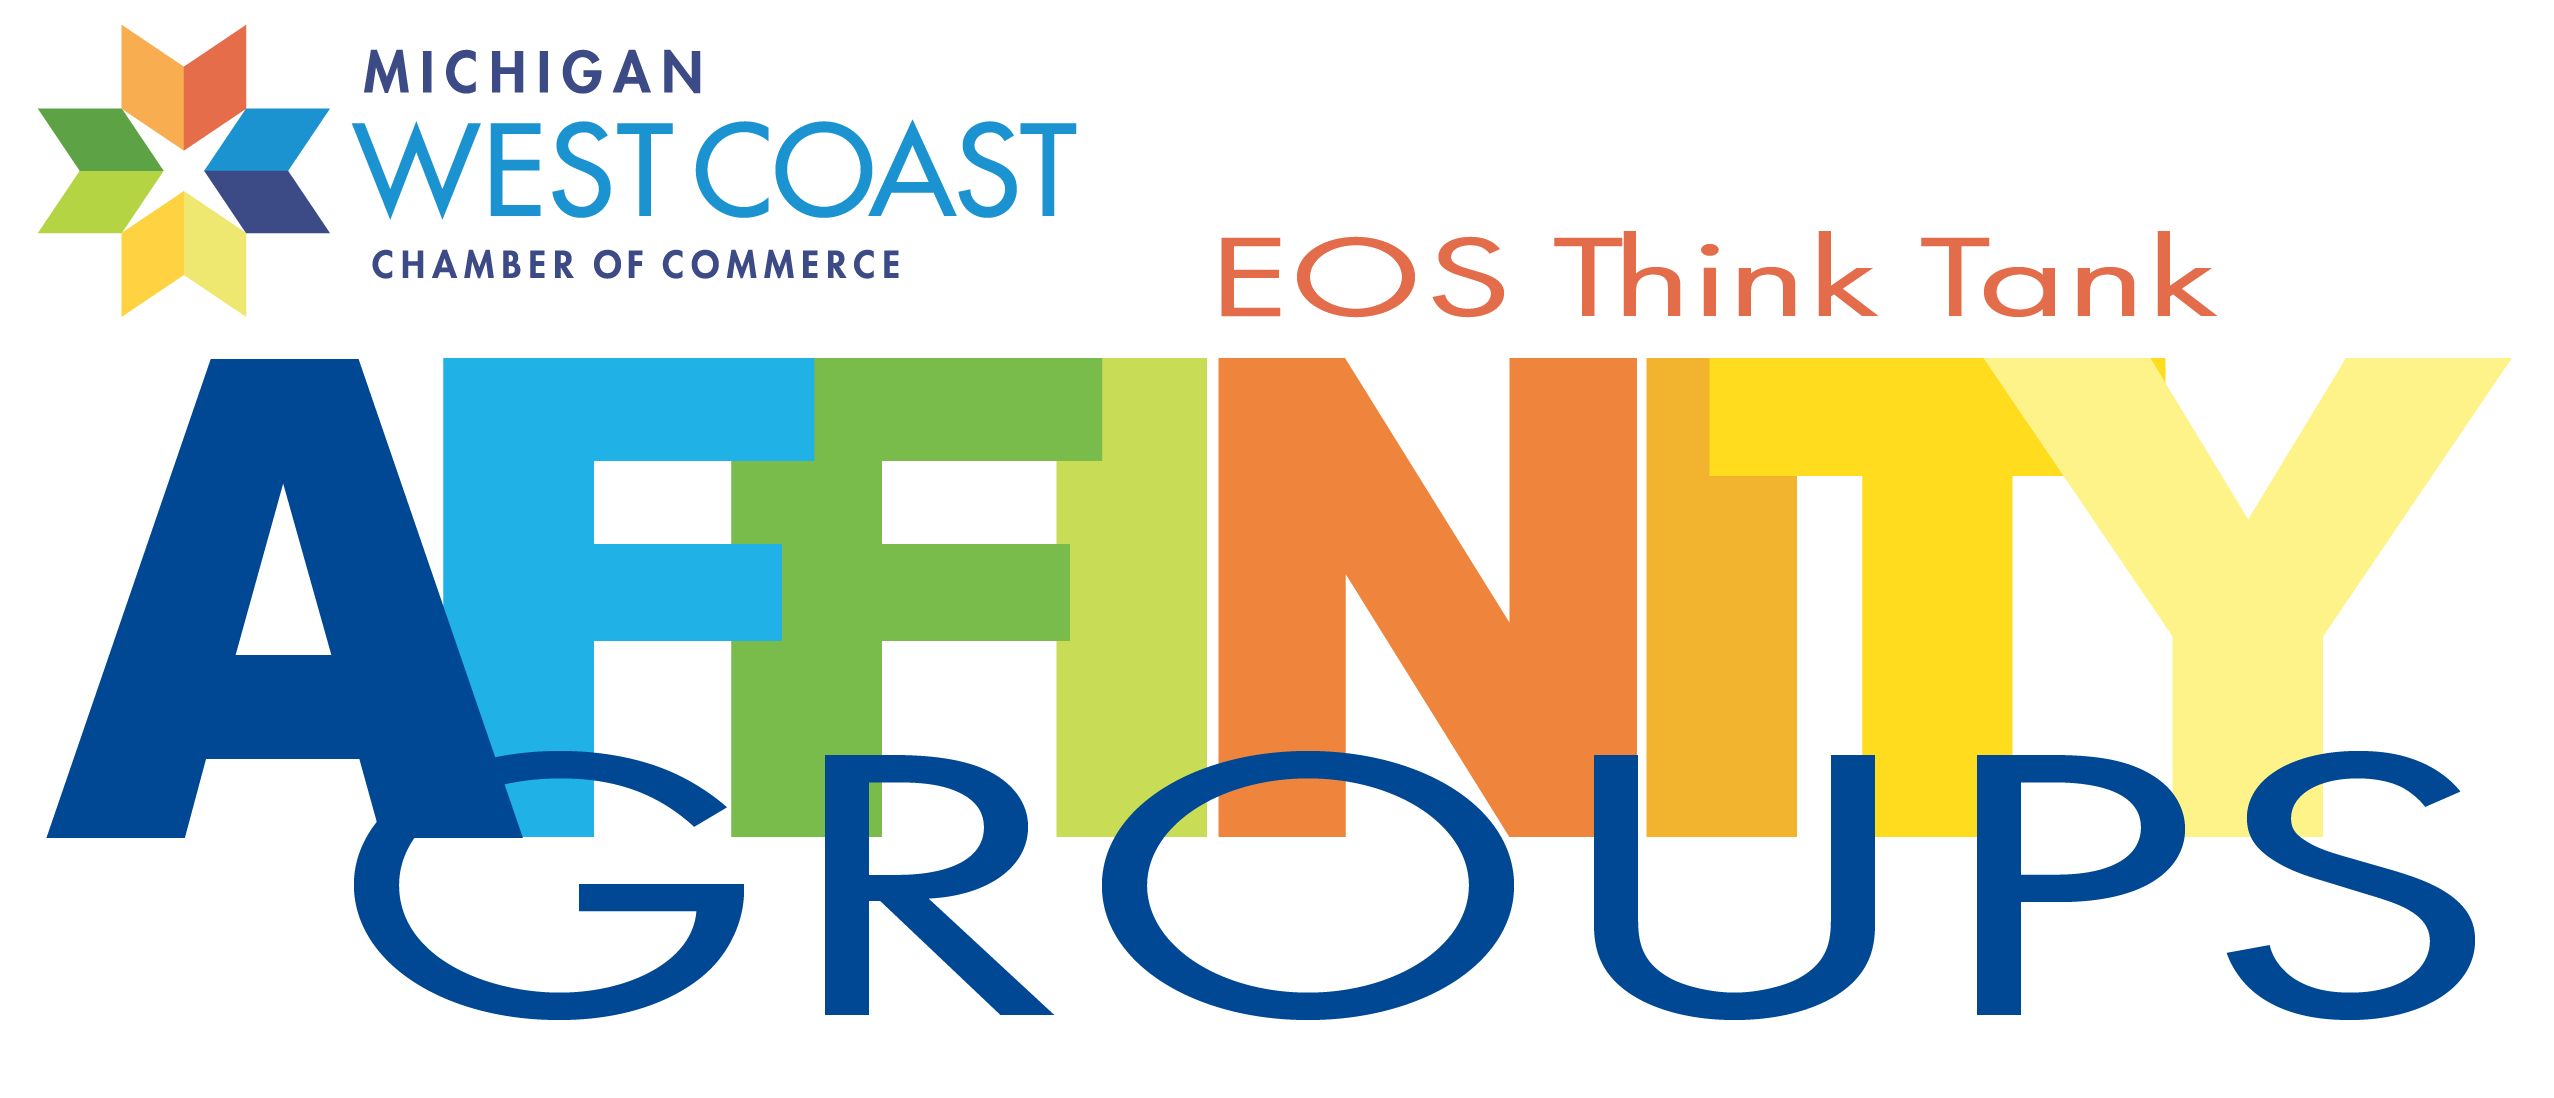 EOS Think Tank Logo